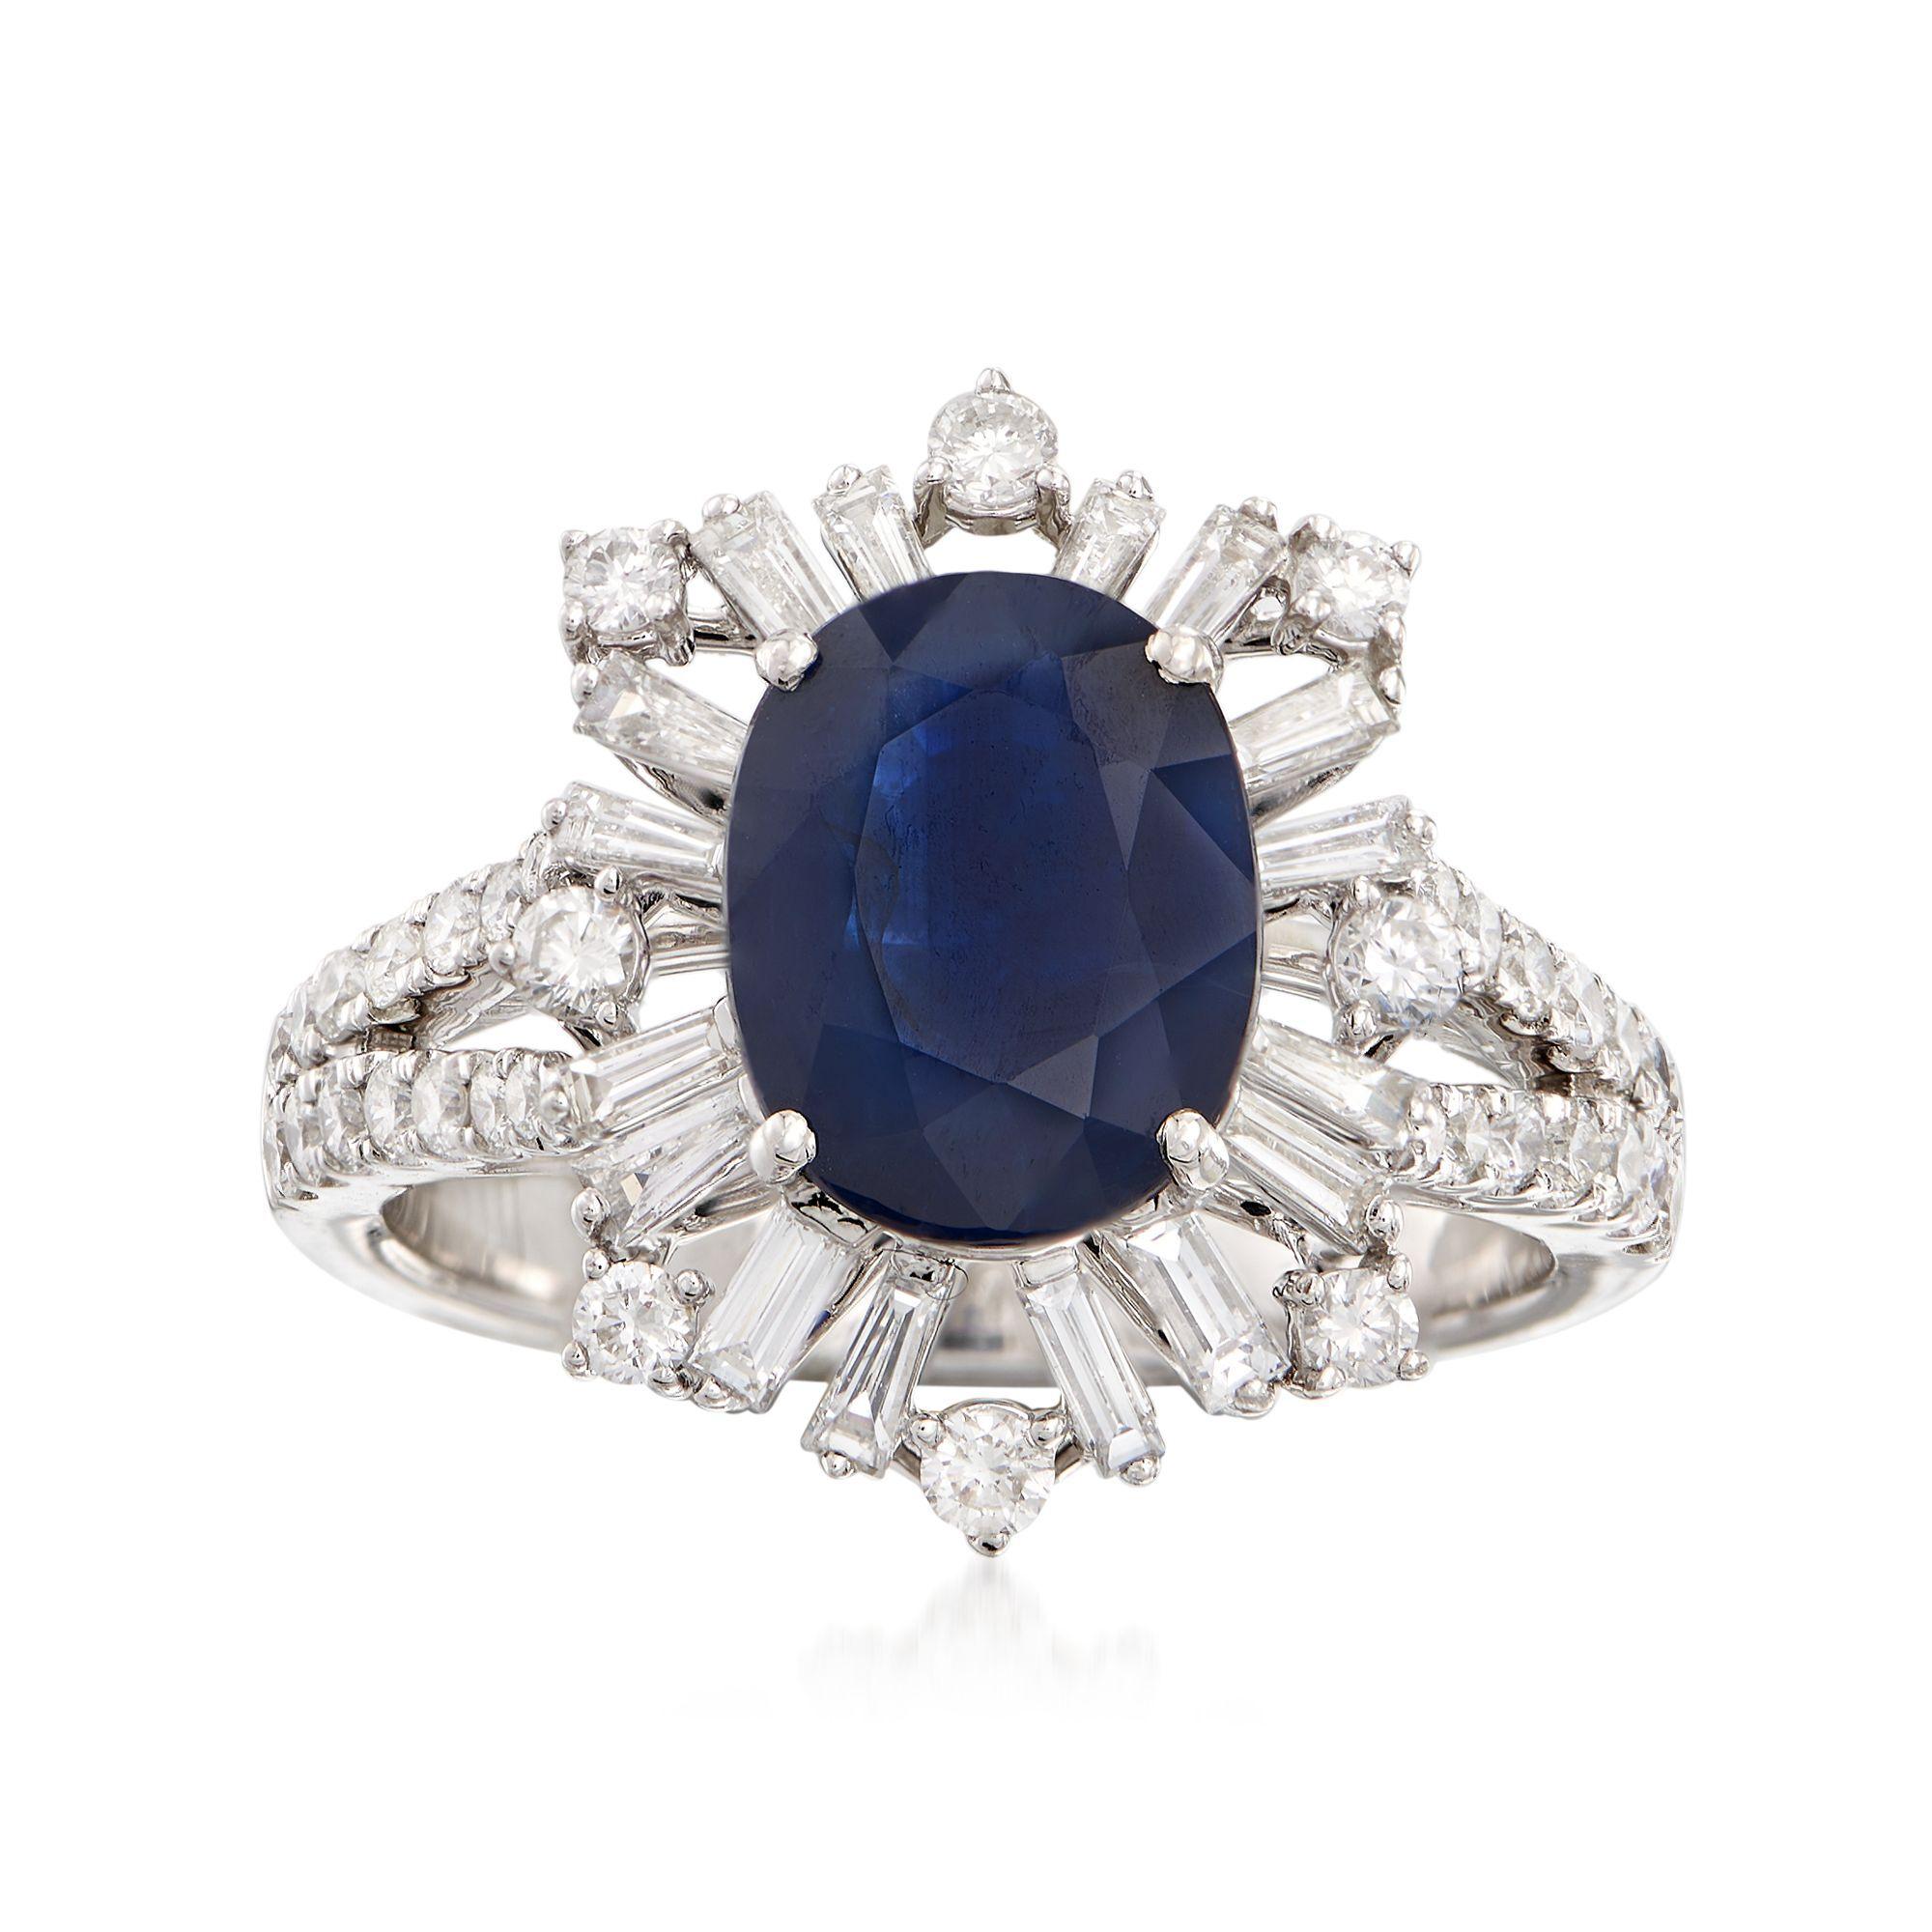 14 kt White Gold Princess Cut 2.75 ct Blue Sapphire Earrings